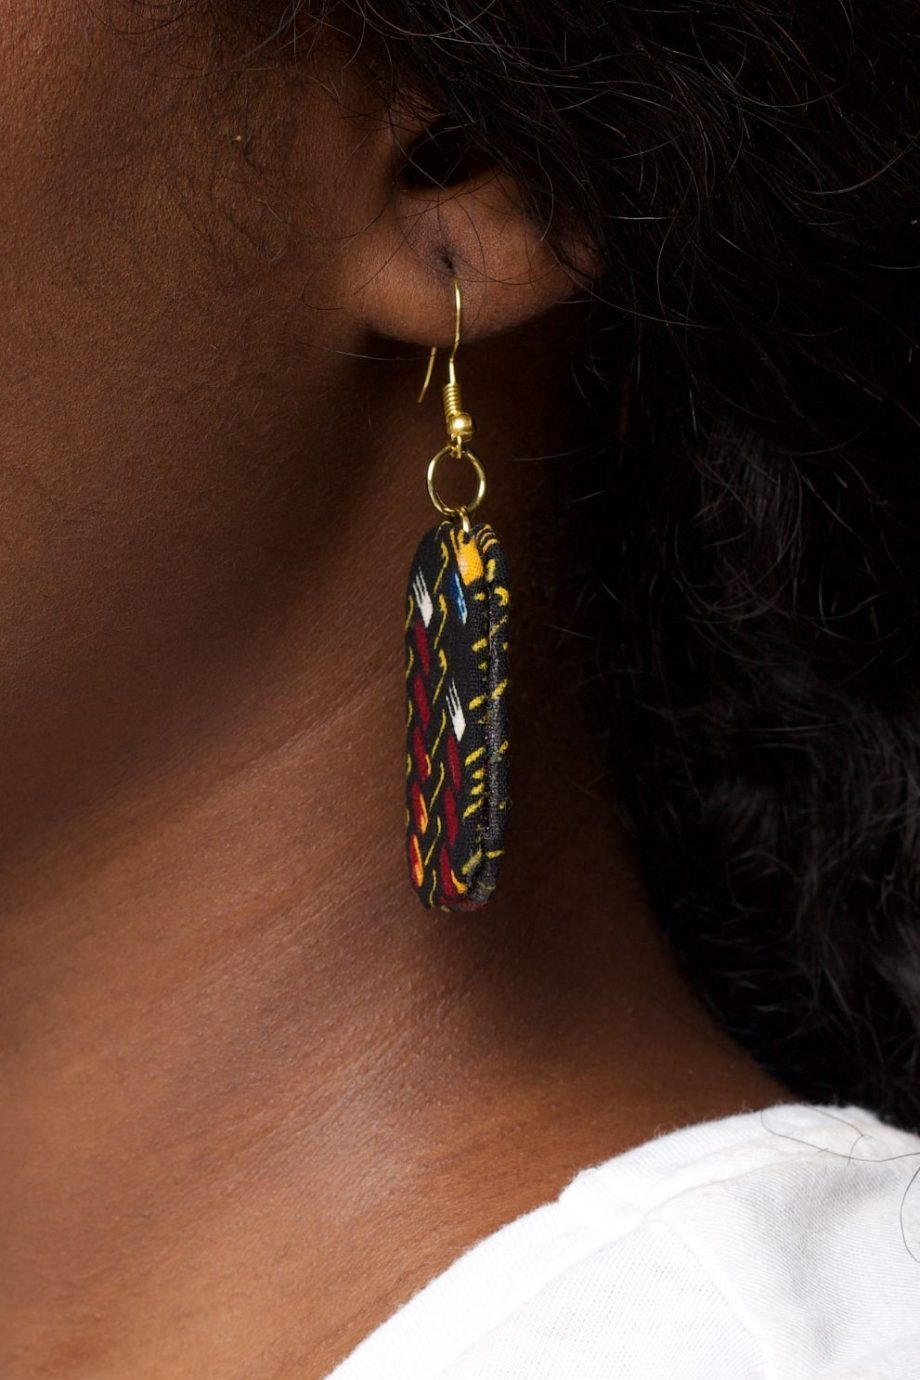 DELE Ankara Earrings by Naborhi